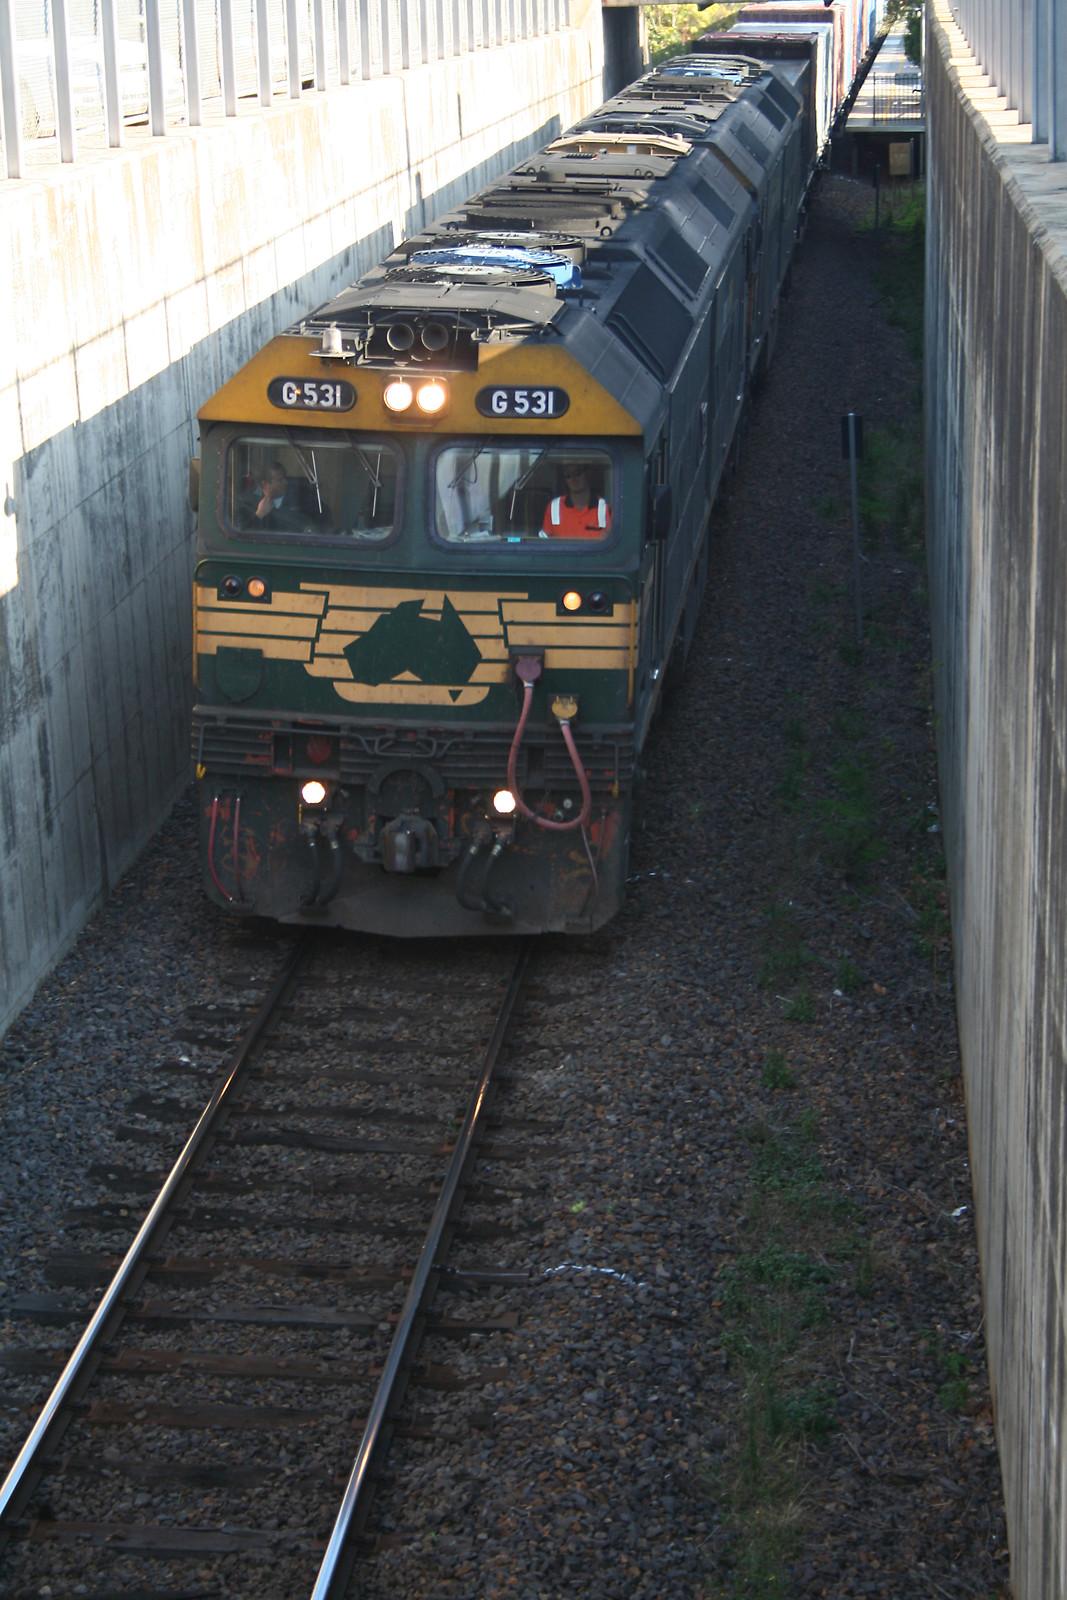 20090501_2920 G 531 at Wangaratta Station by williewonker